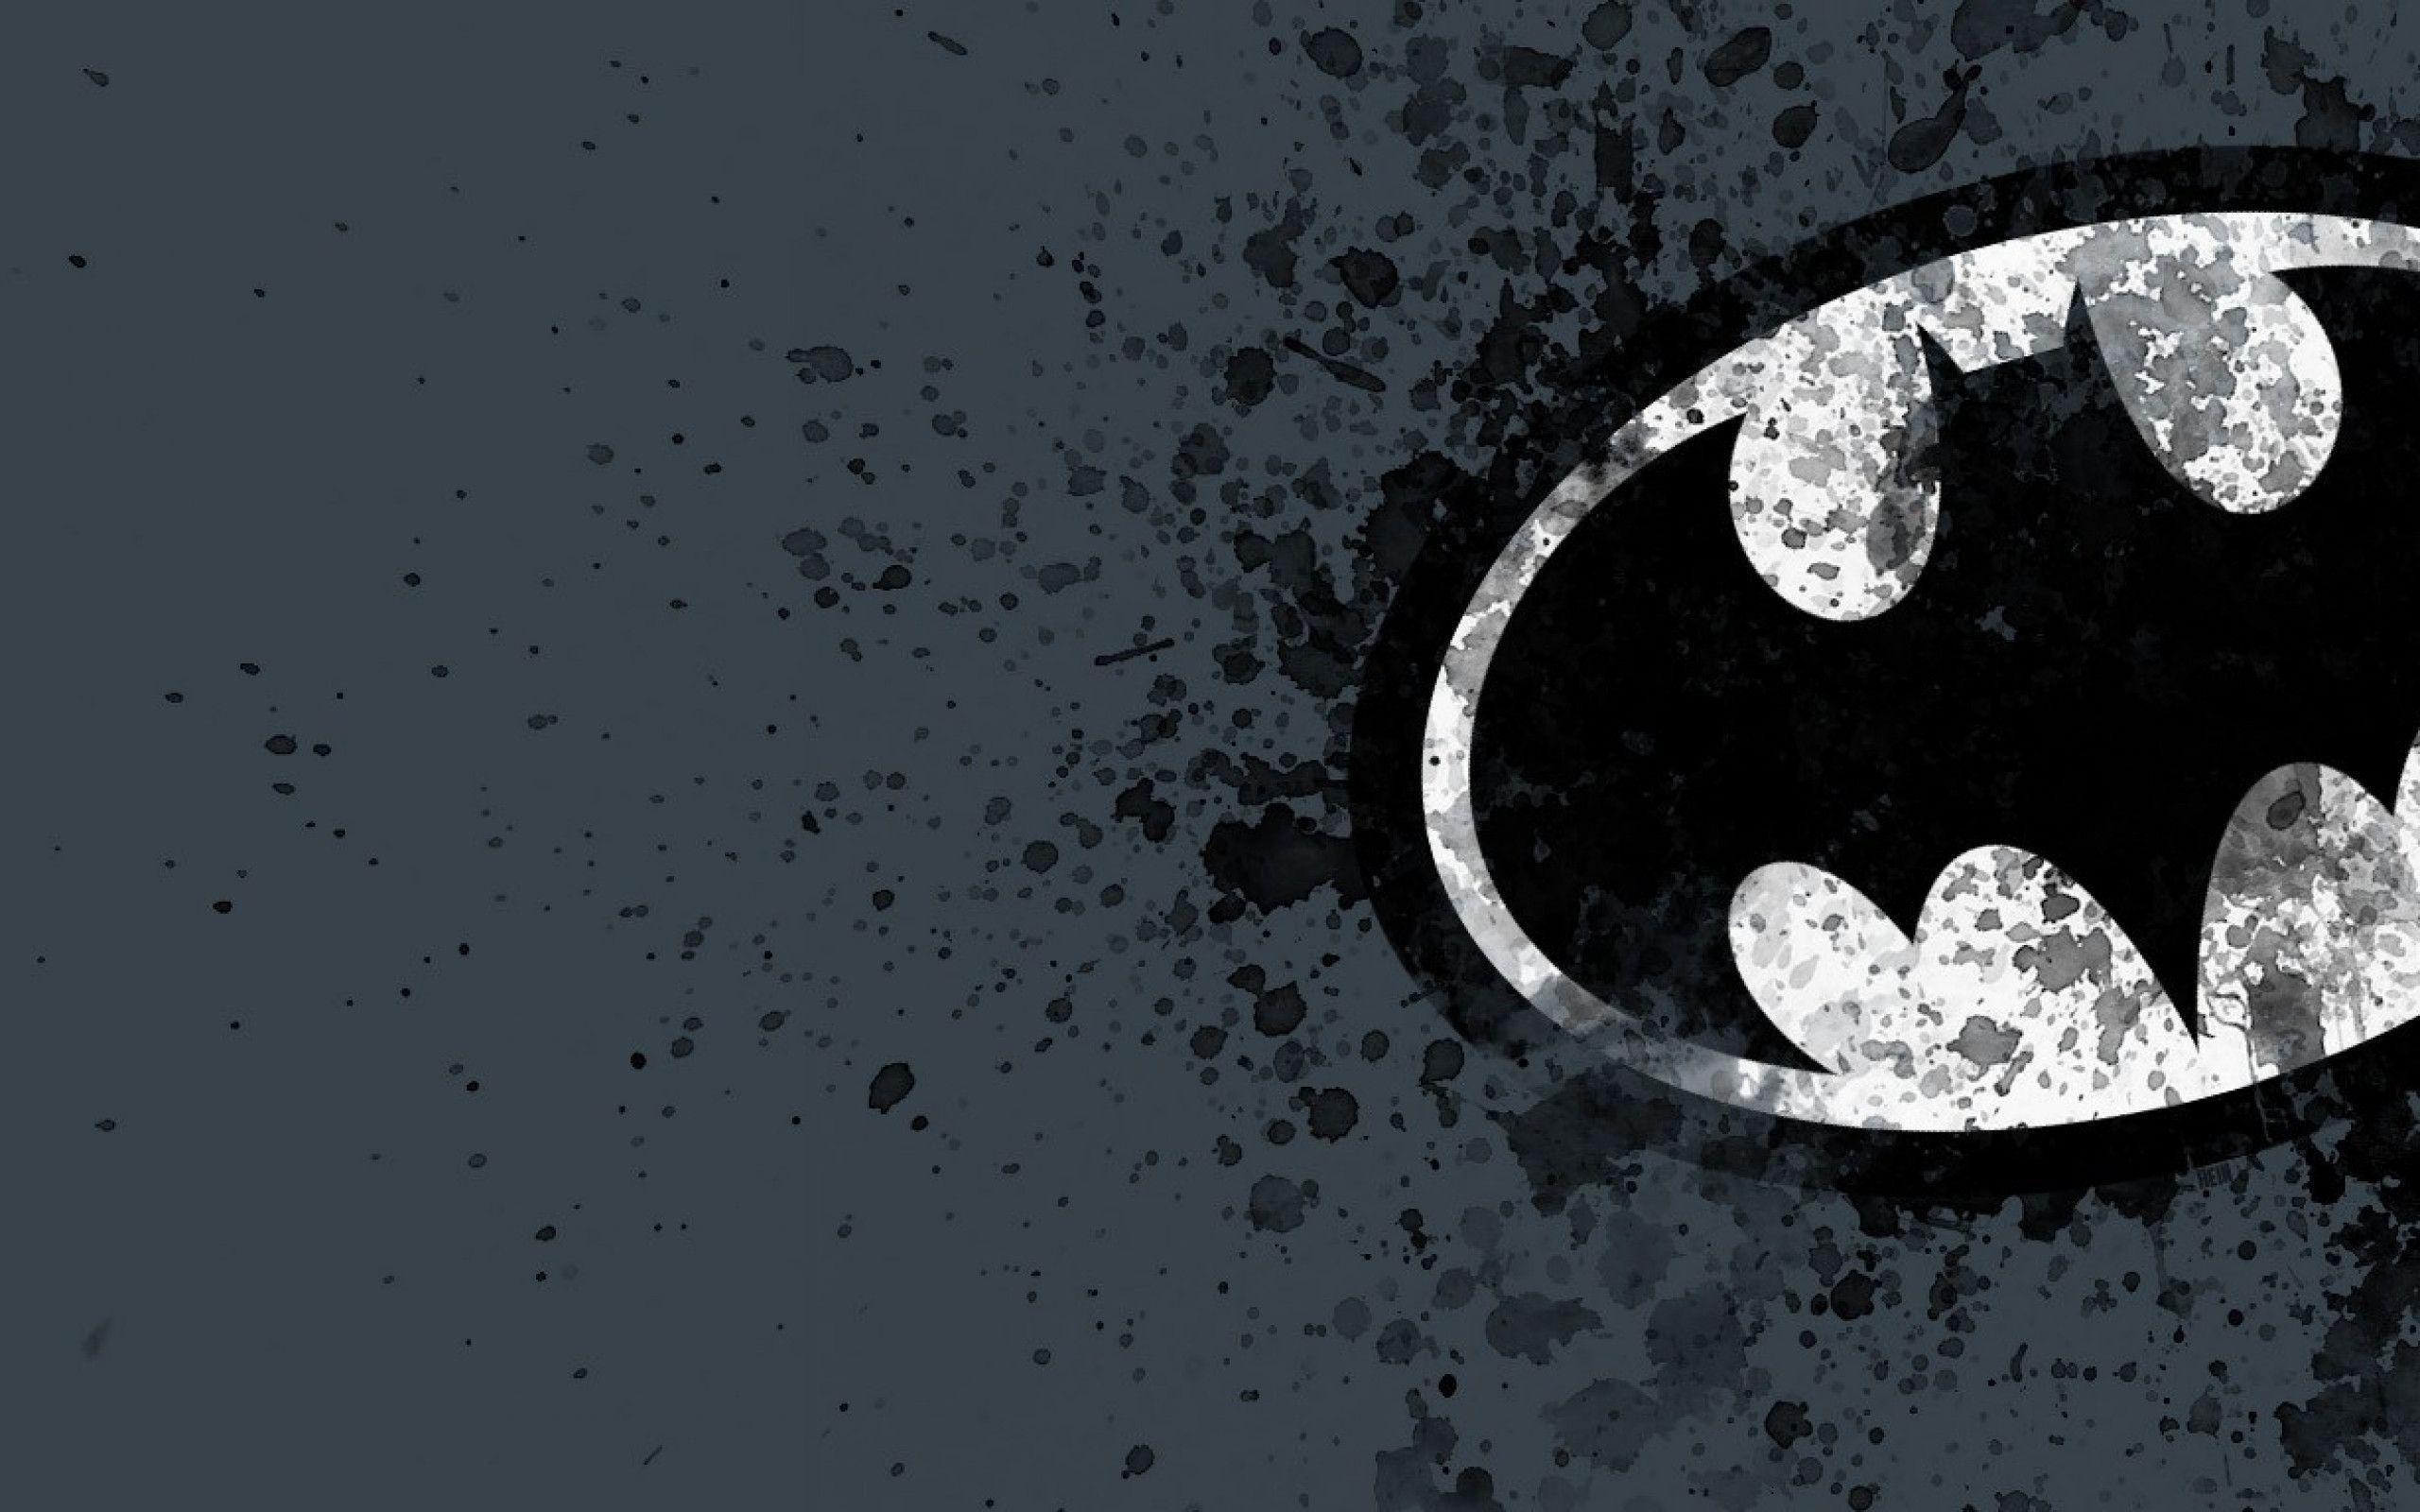 Batman wallpaper ·① Download free amazing HD wallpapers of ...